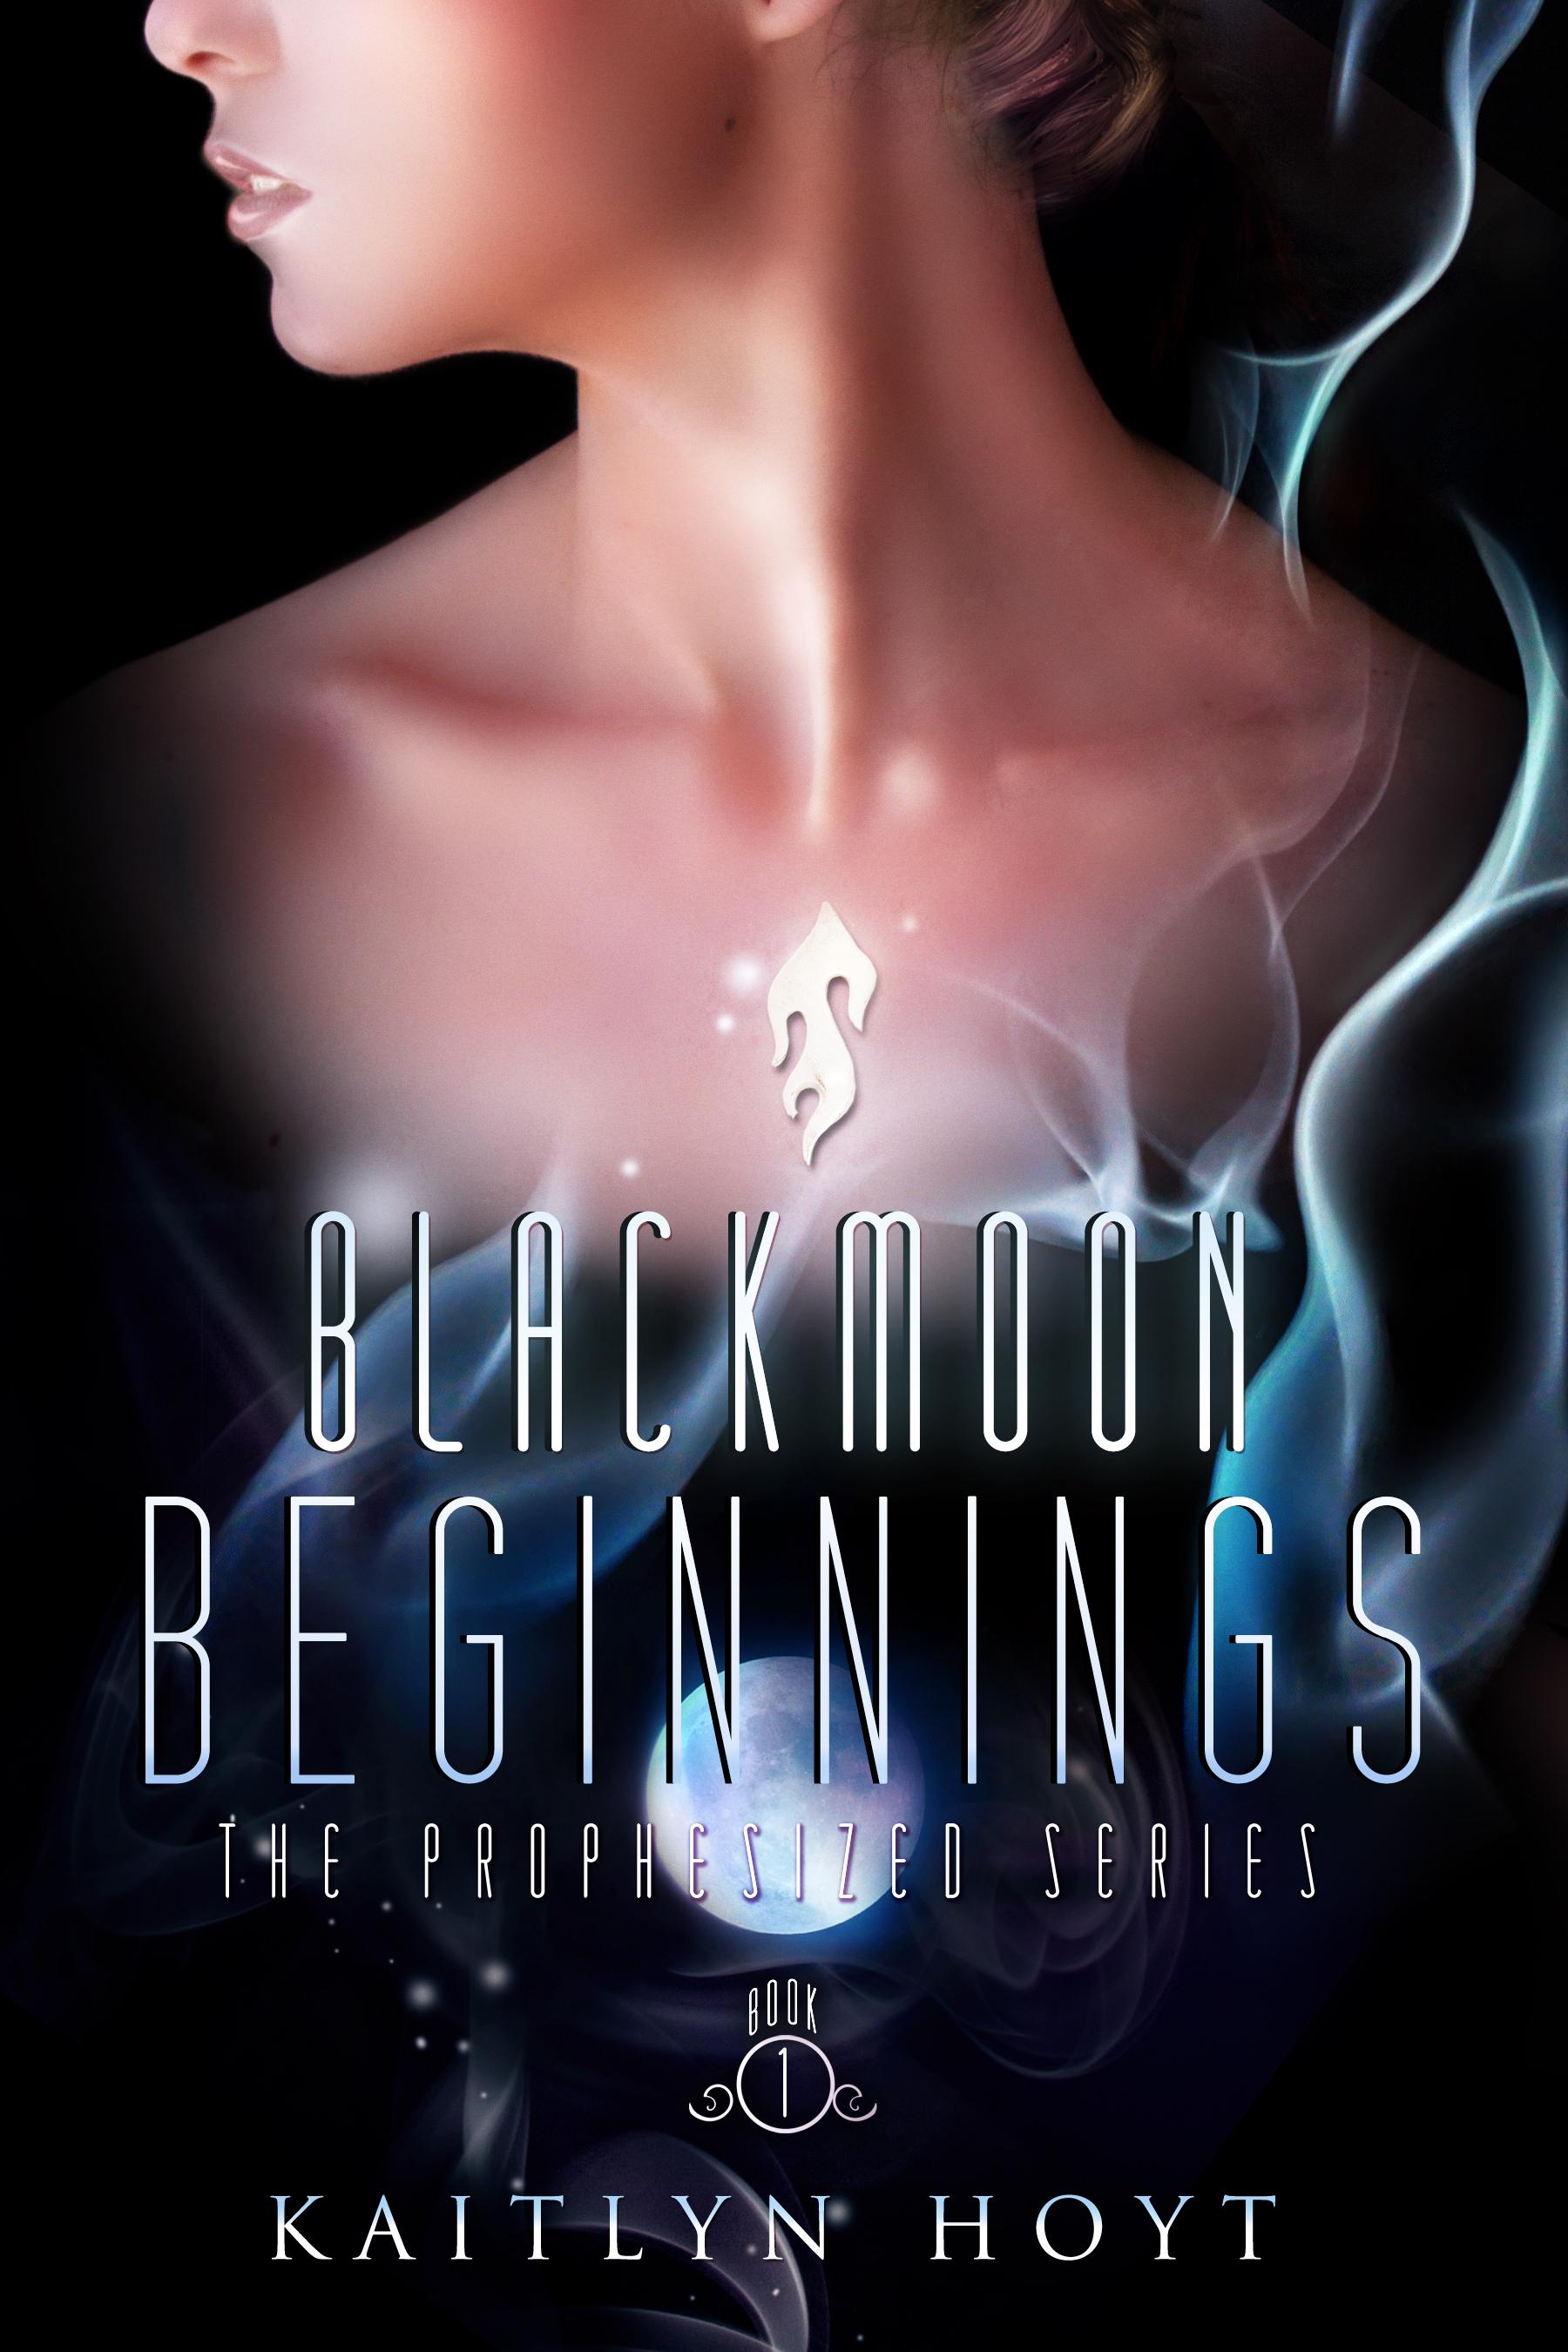 BlackMoon Beginnings  (sst-ccxcix)